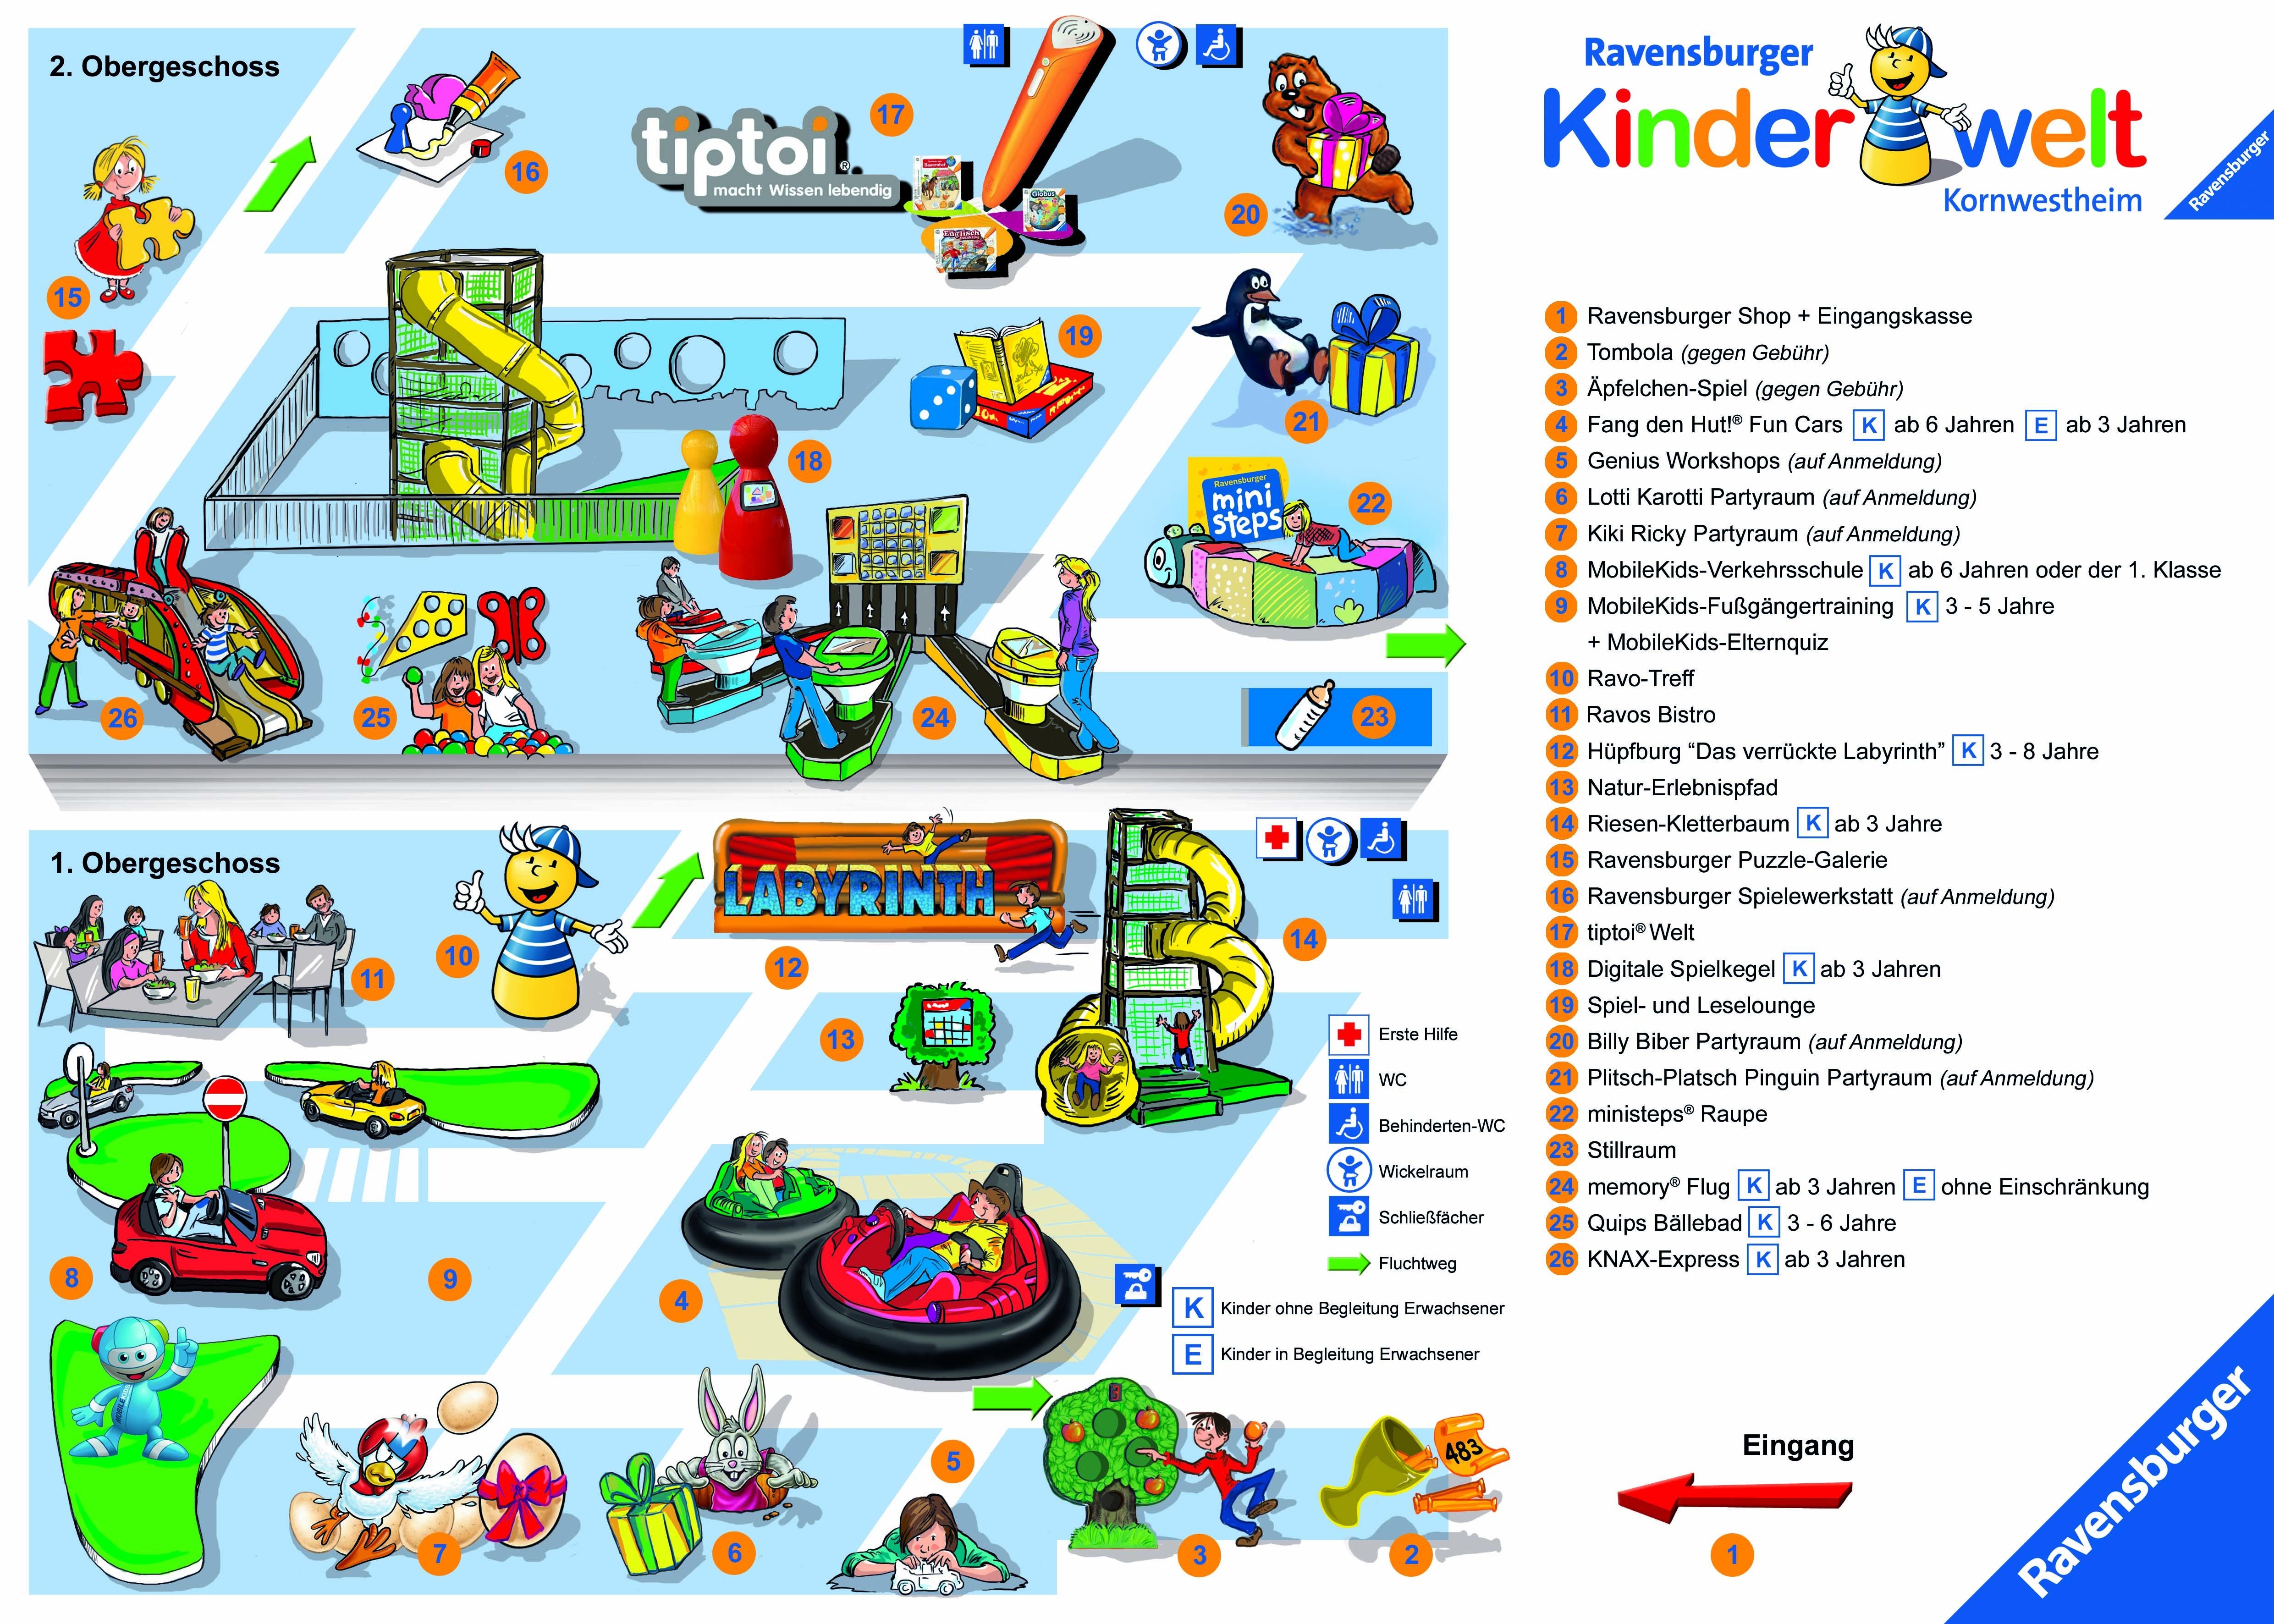 Parkplan Ravensburger Kinderwelt